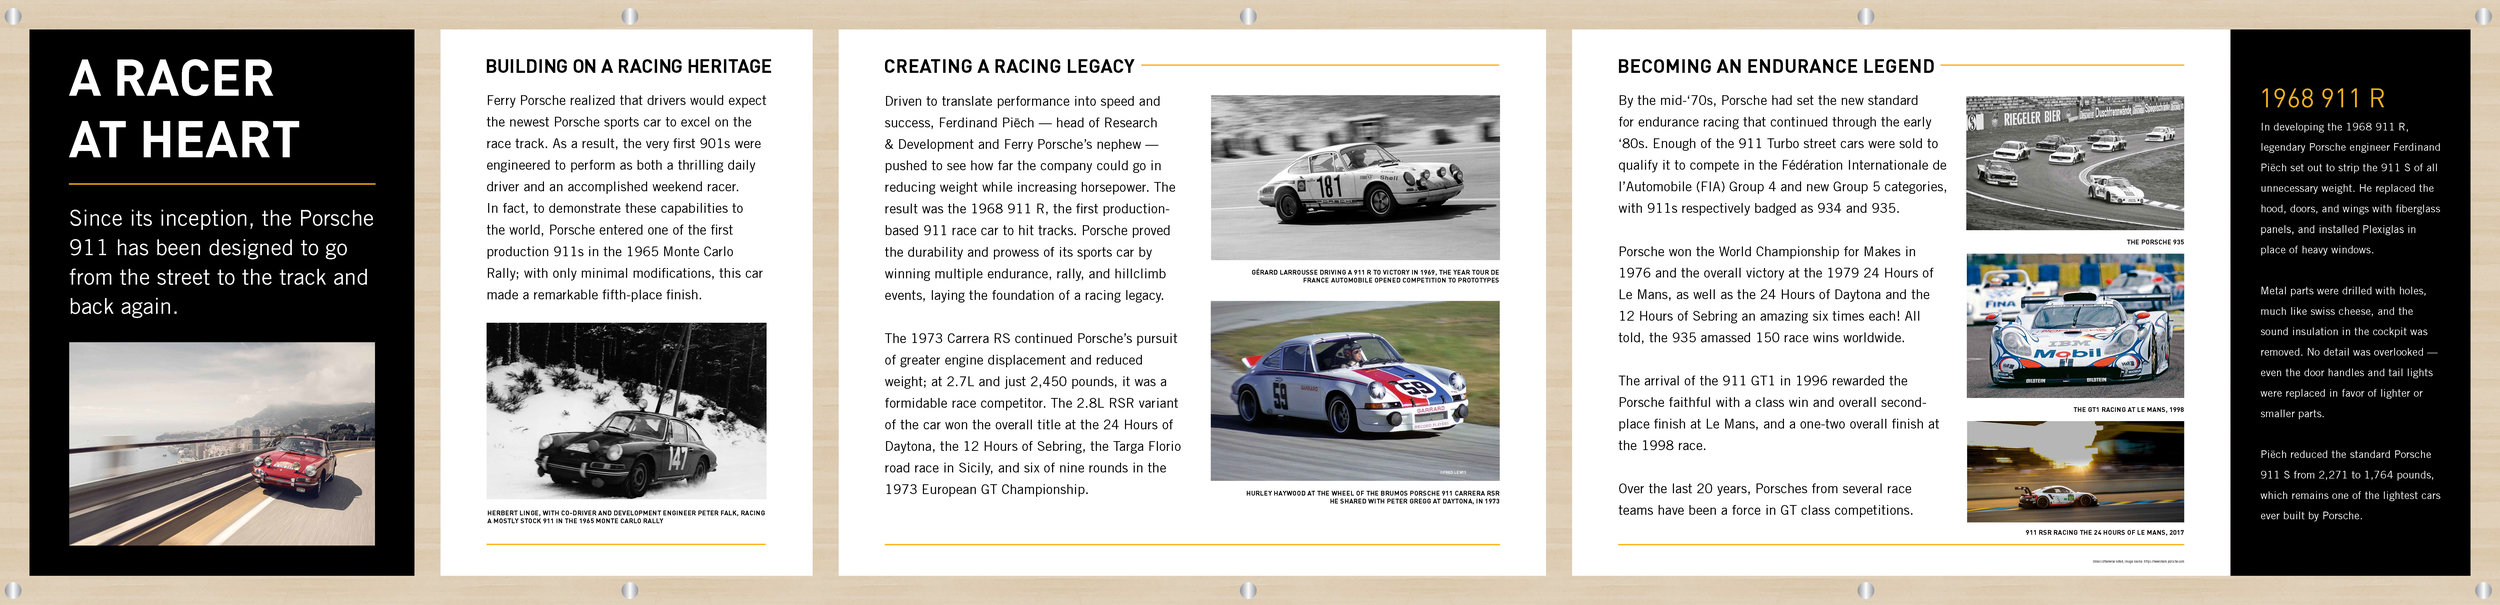 Porsche_Interpretive Panels_v11_Page_2.jpg